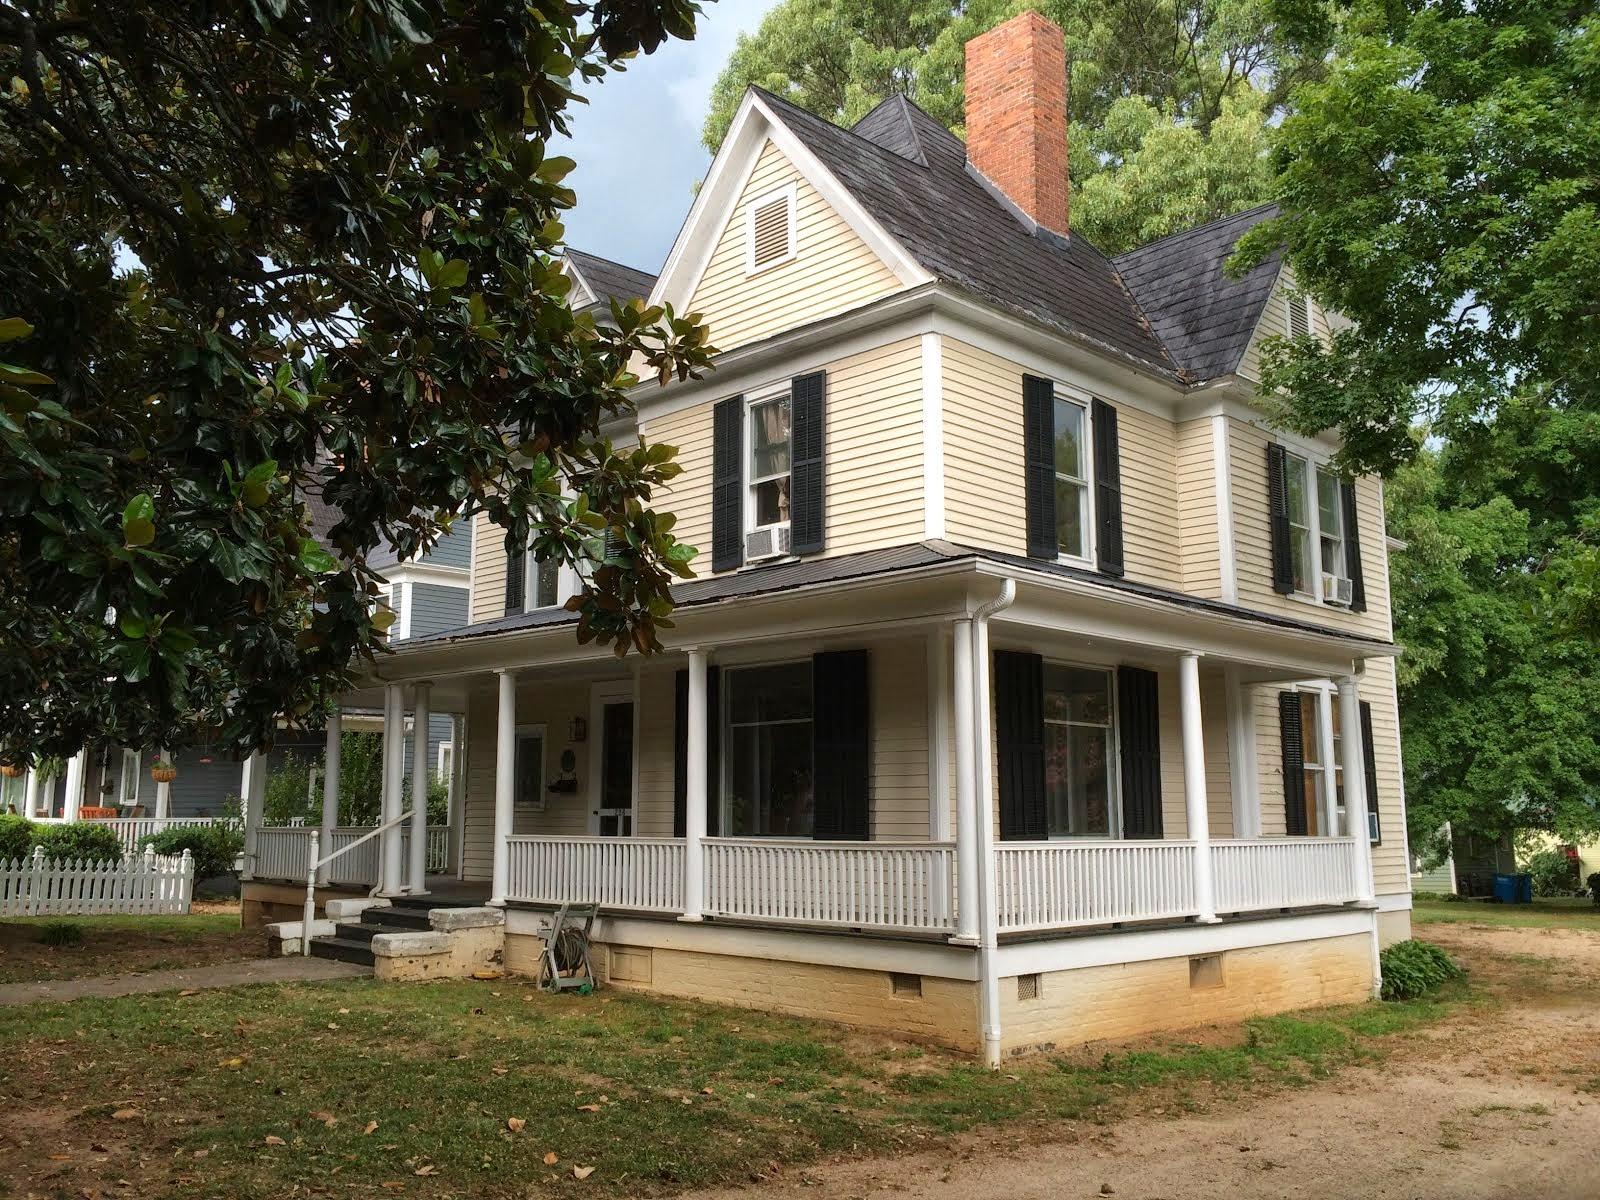 226 S. Ellis Street, Salisbury NC ~ CIRCA 1900 ~ $200,000